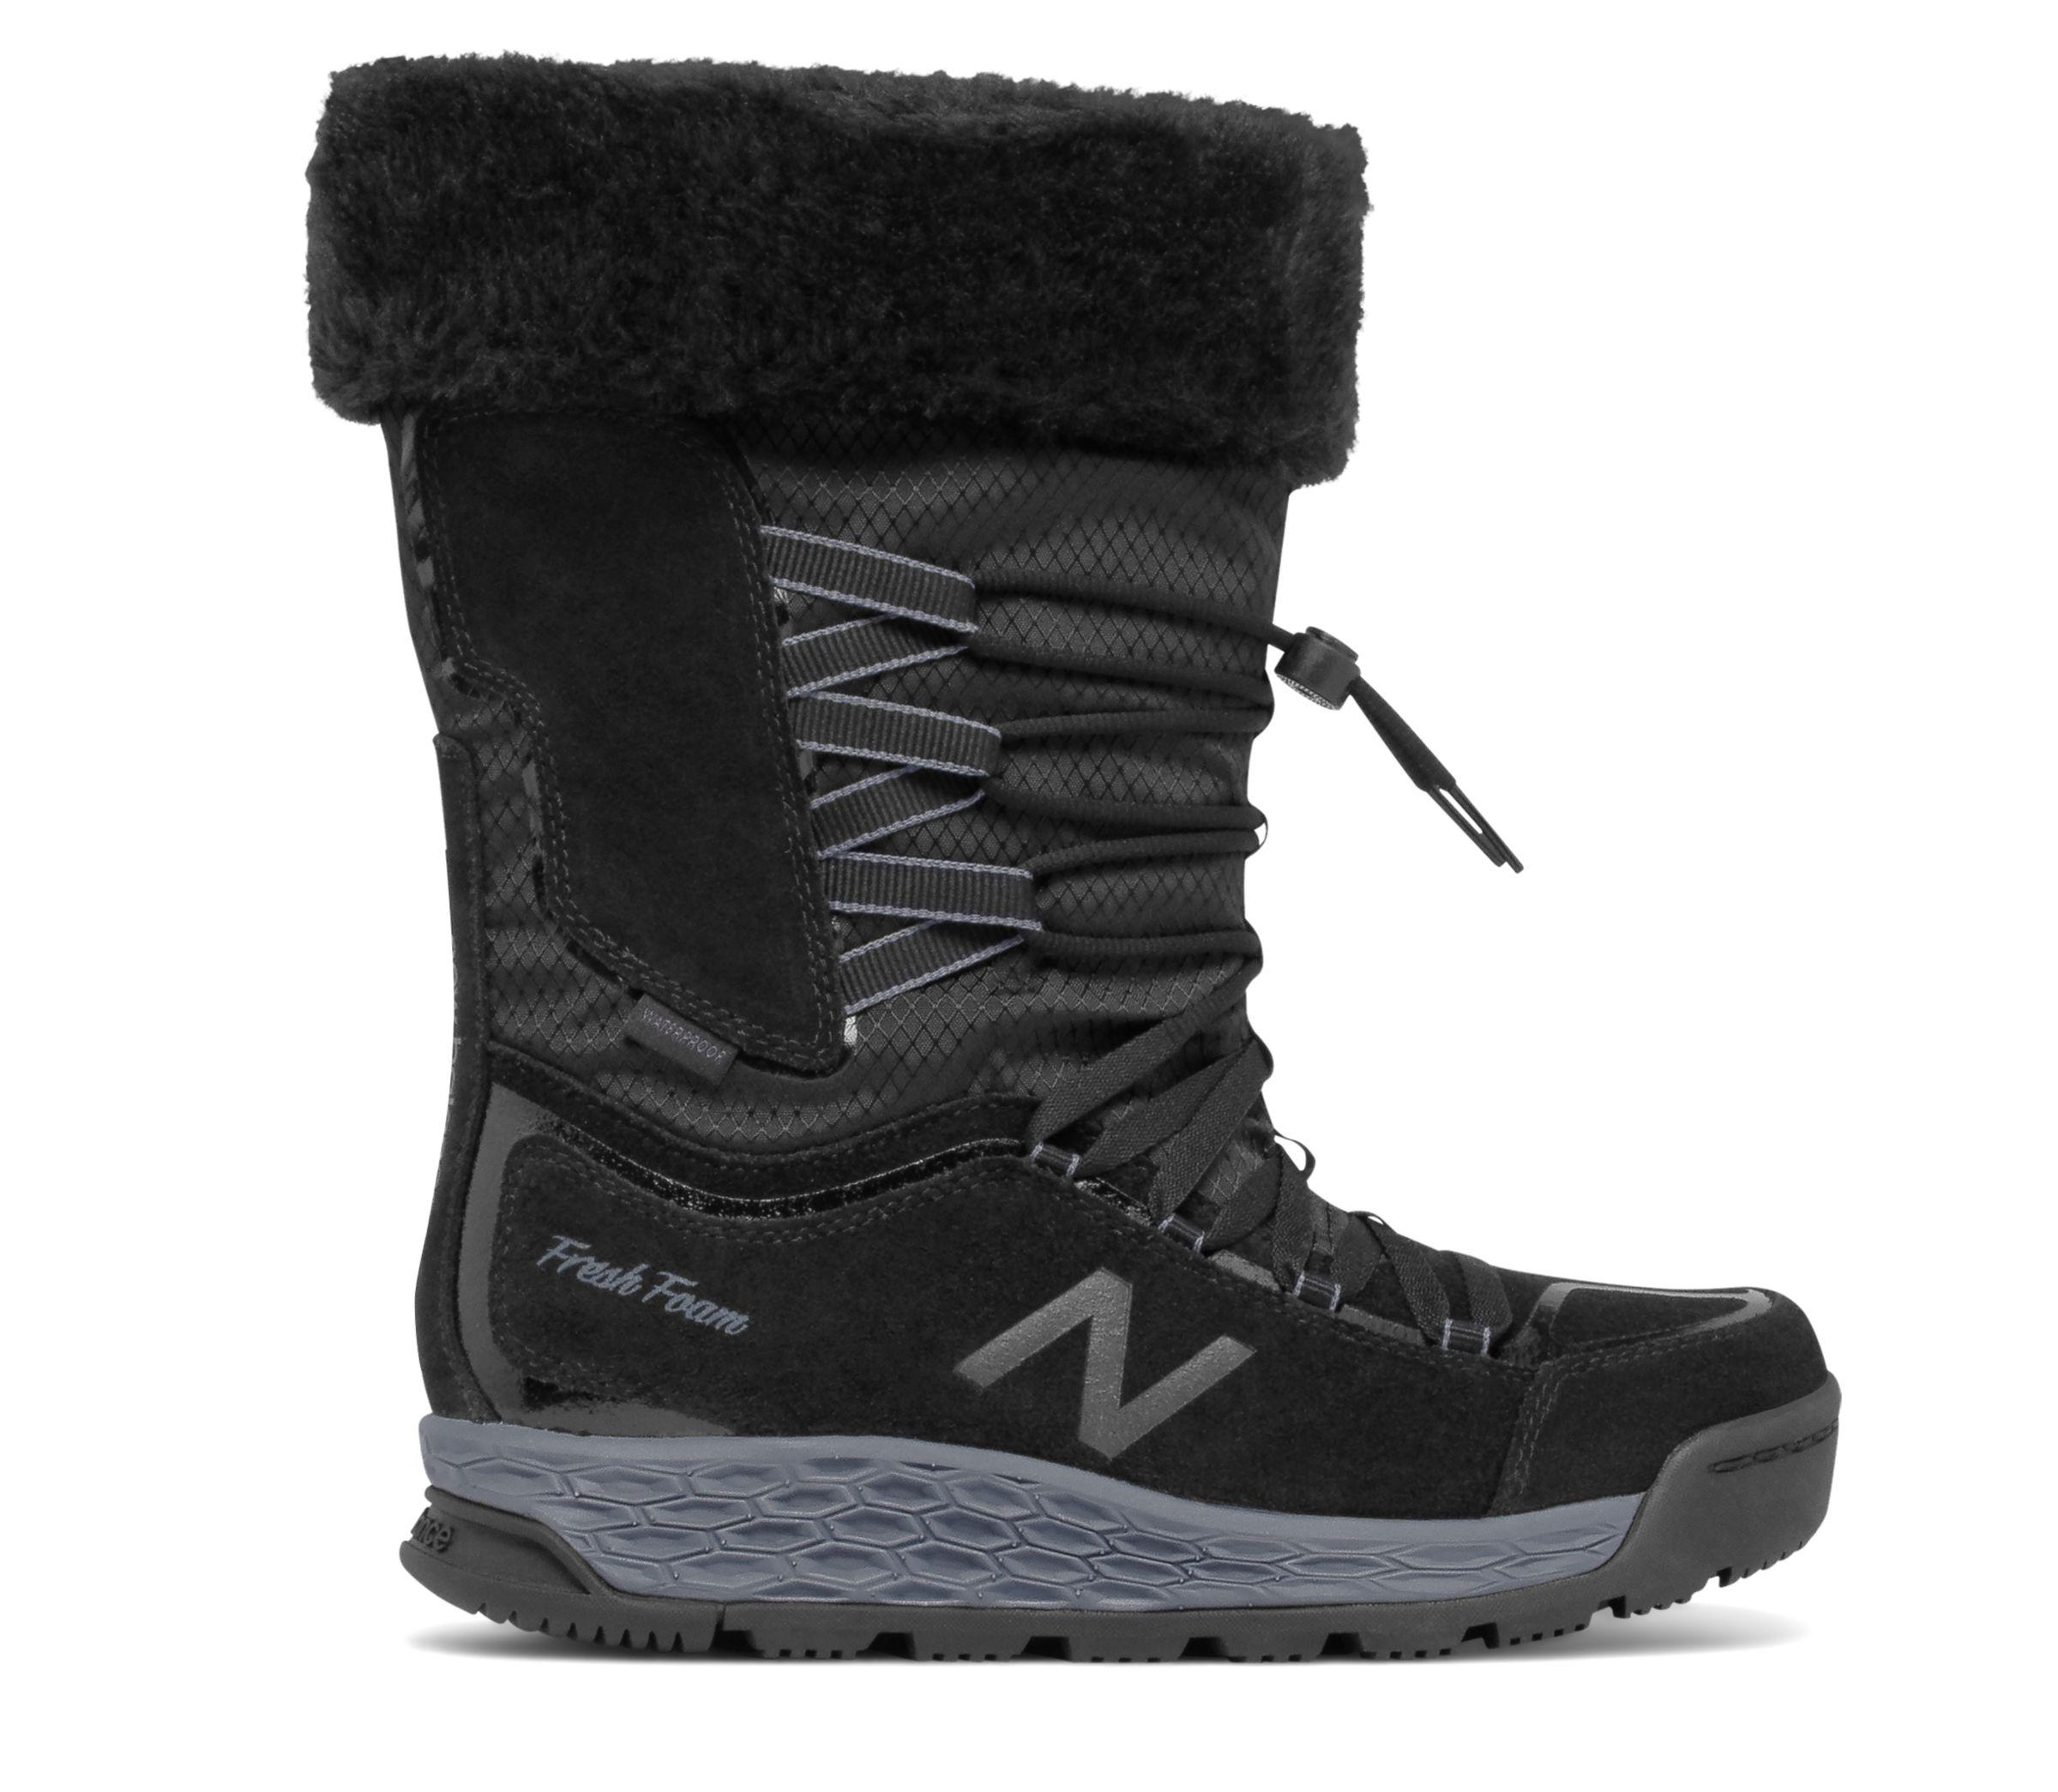 New Balance : Fresh Foam 1000 Boot : Women's Hiking & Walking : BW1000BK